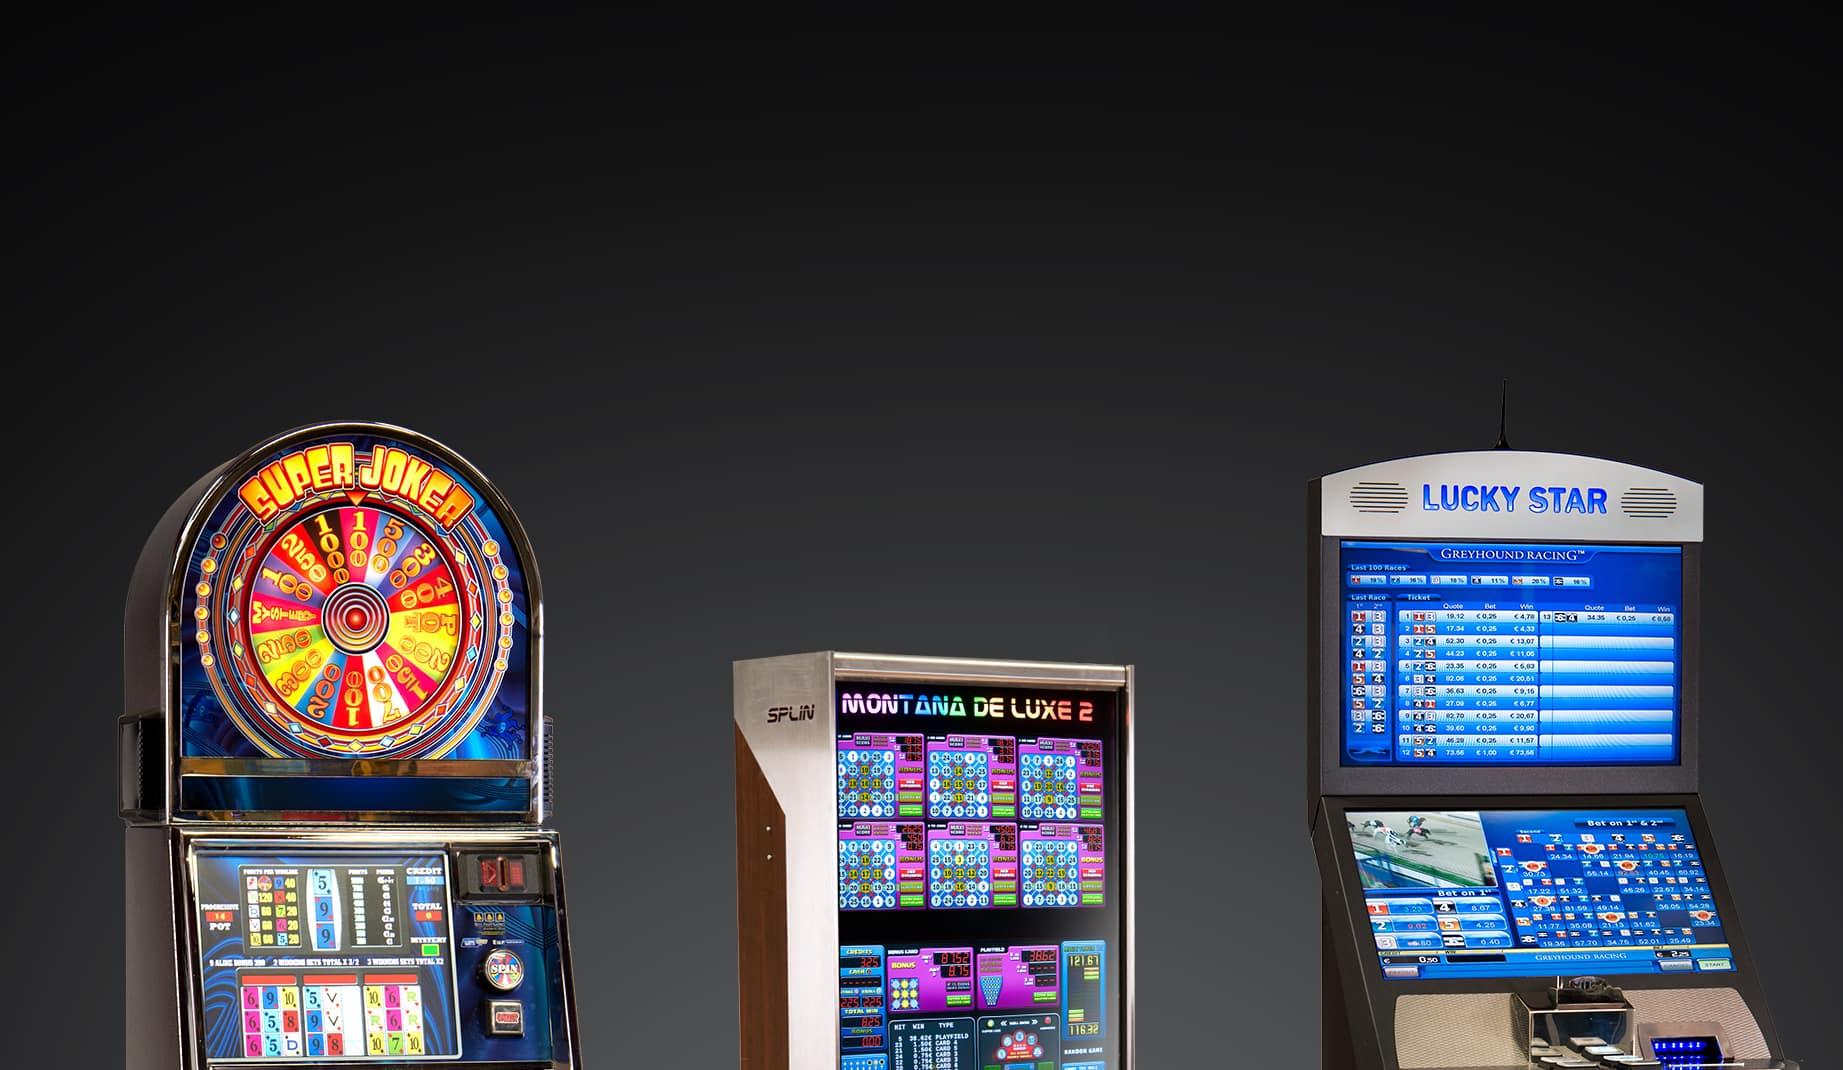 Overzicht speelautomaten - Lucky Star